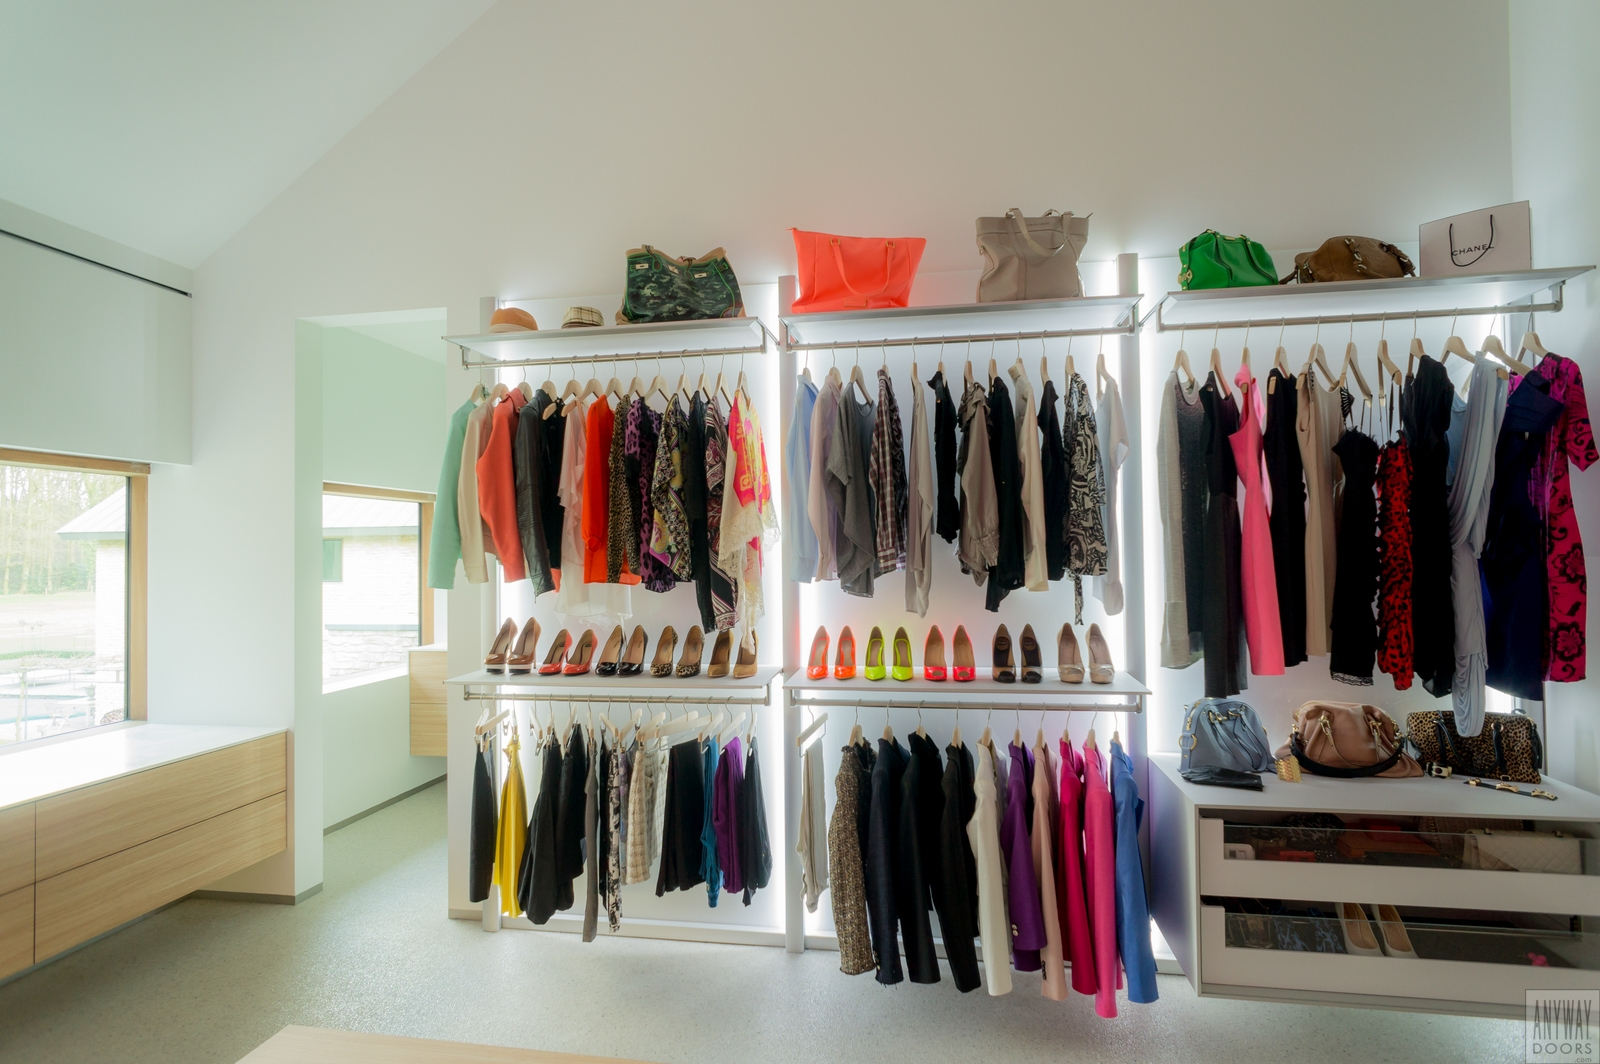 Design slaapkamerkasten op maat dress a way kasten op maat - Foto moderne dressing ...